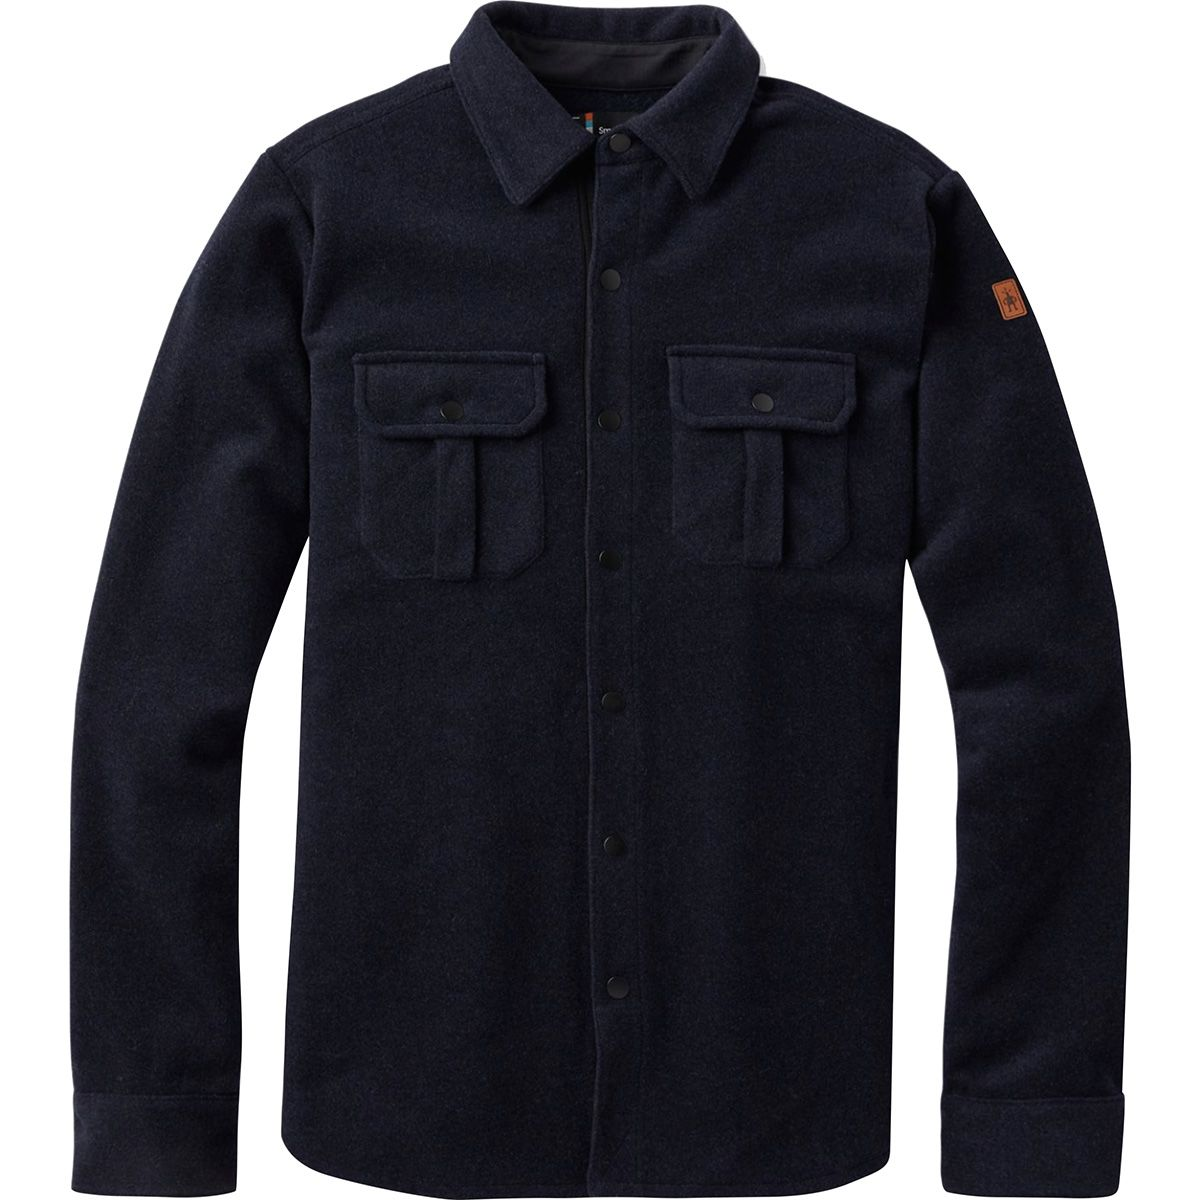 photo: Smartwool Men's Anchor Line Shirt Jacket wool jacket